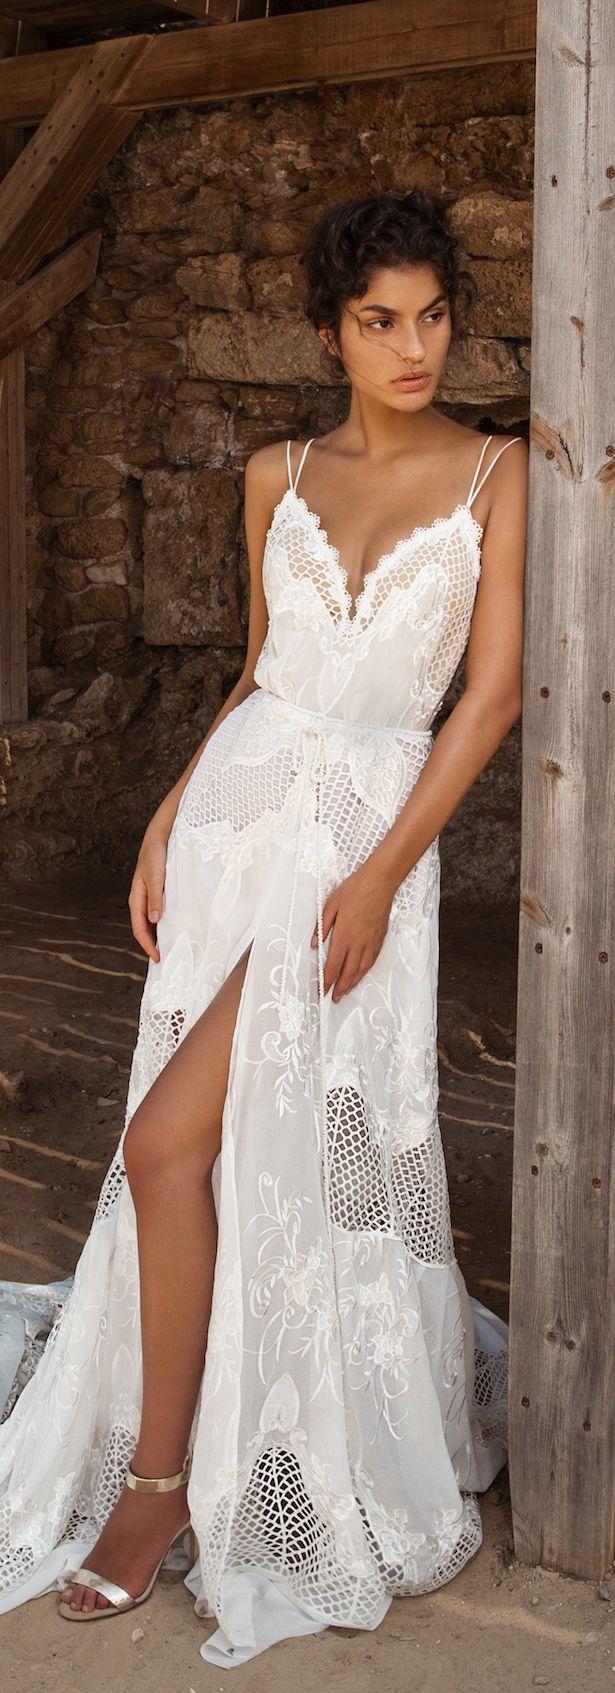 dresses for beach wedding GALA by Galia Lahav Collection NO III Wedding Dresses